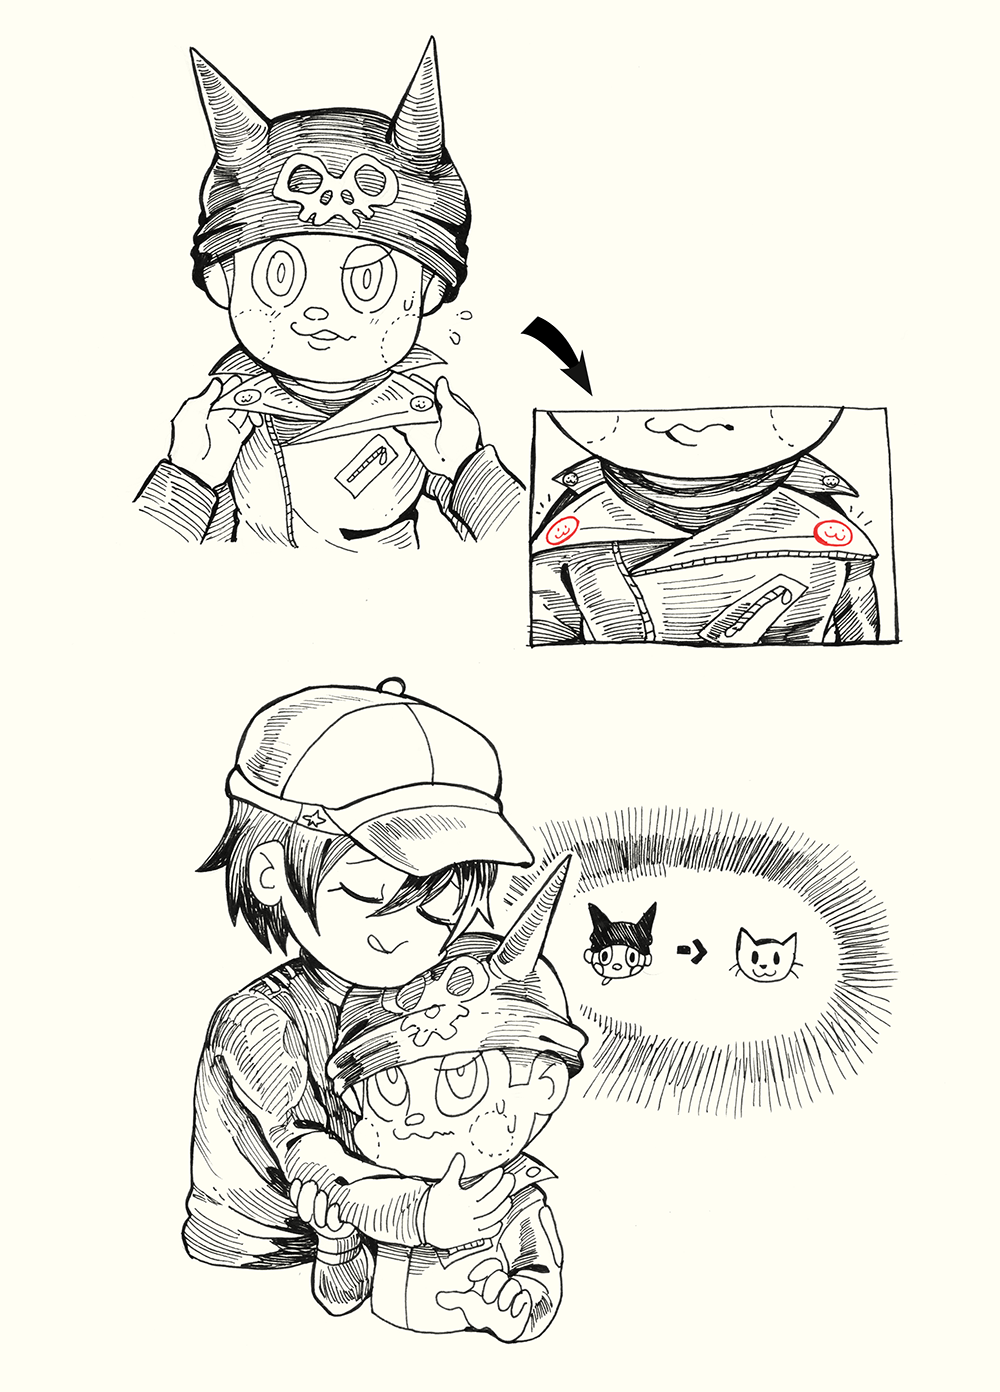 Yes Shuichi I Too Find Ryoma Adorable And Awesome Danganronpa Danganronpa Memes Danganronpa Characters Ryoma hoshi x kaede akamatsu headcanons! yes shuichi i too find ryoma adorable